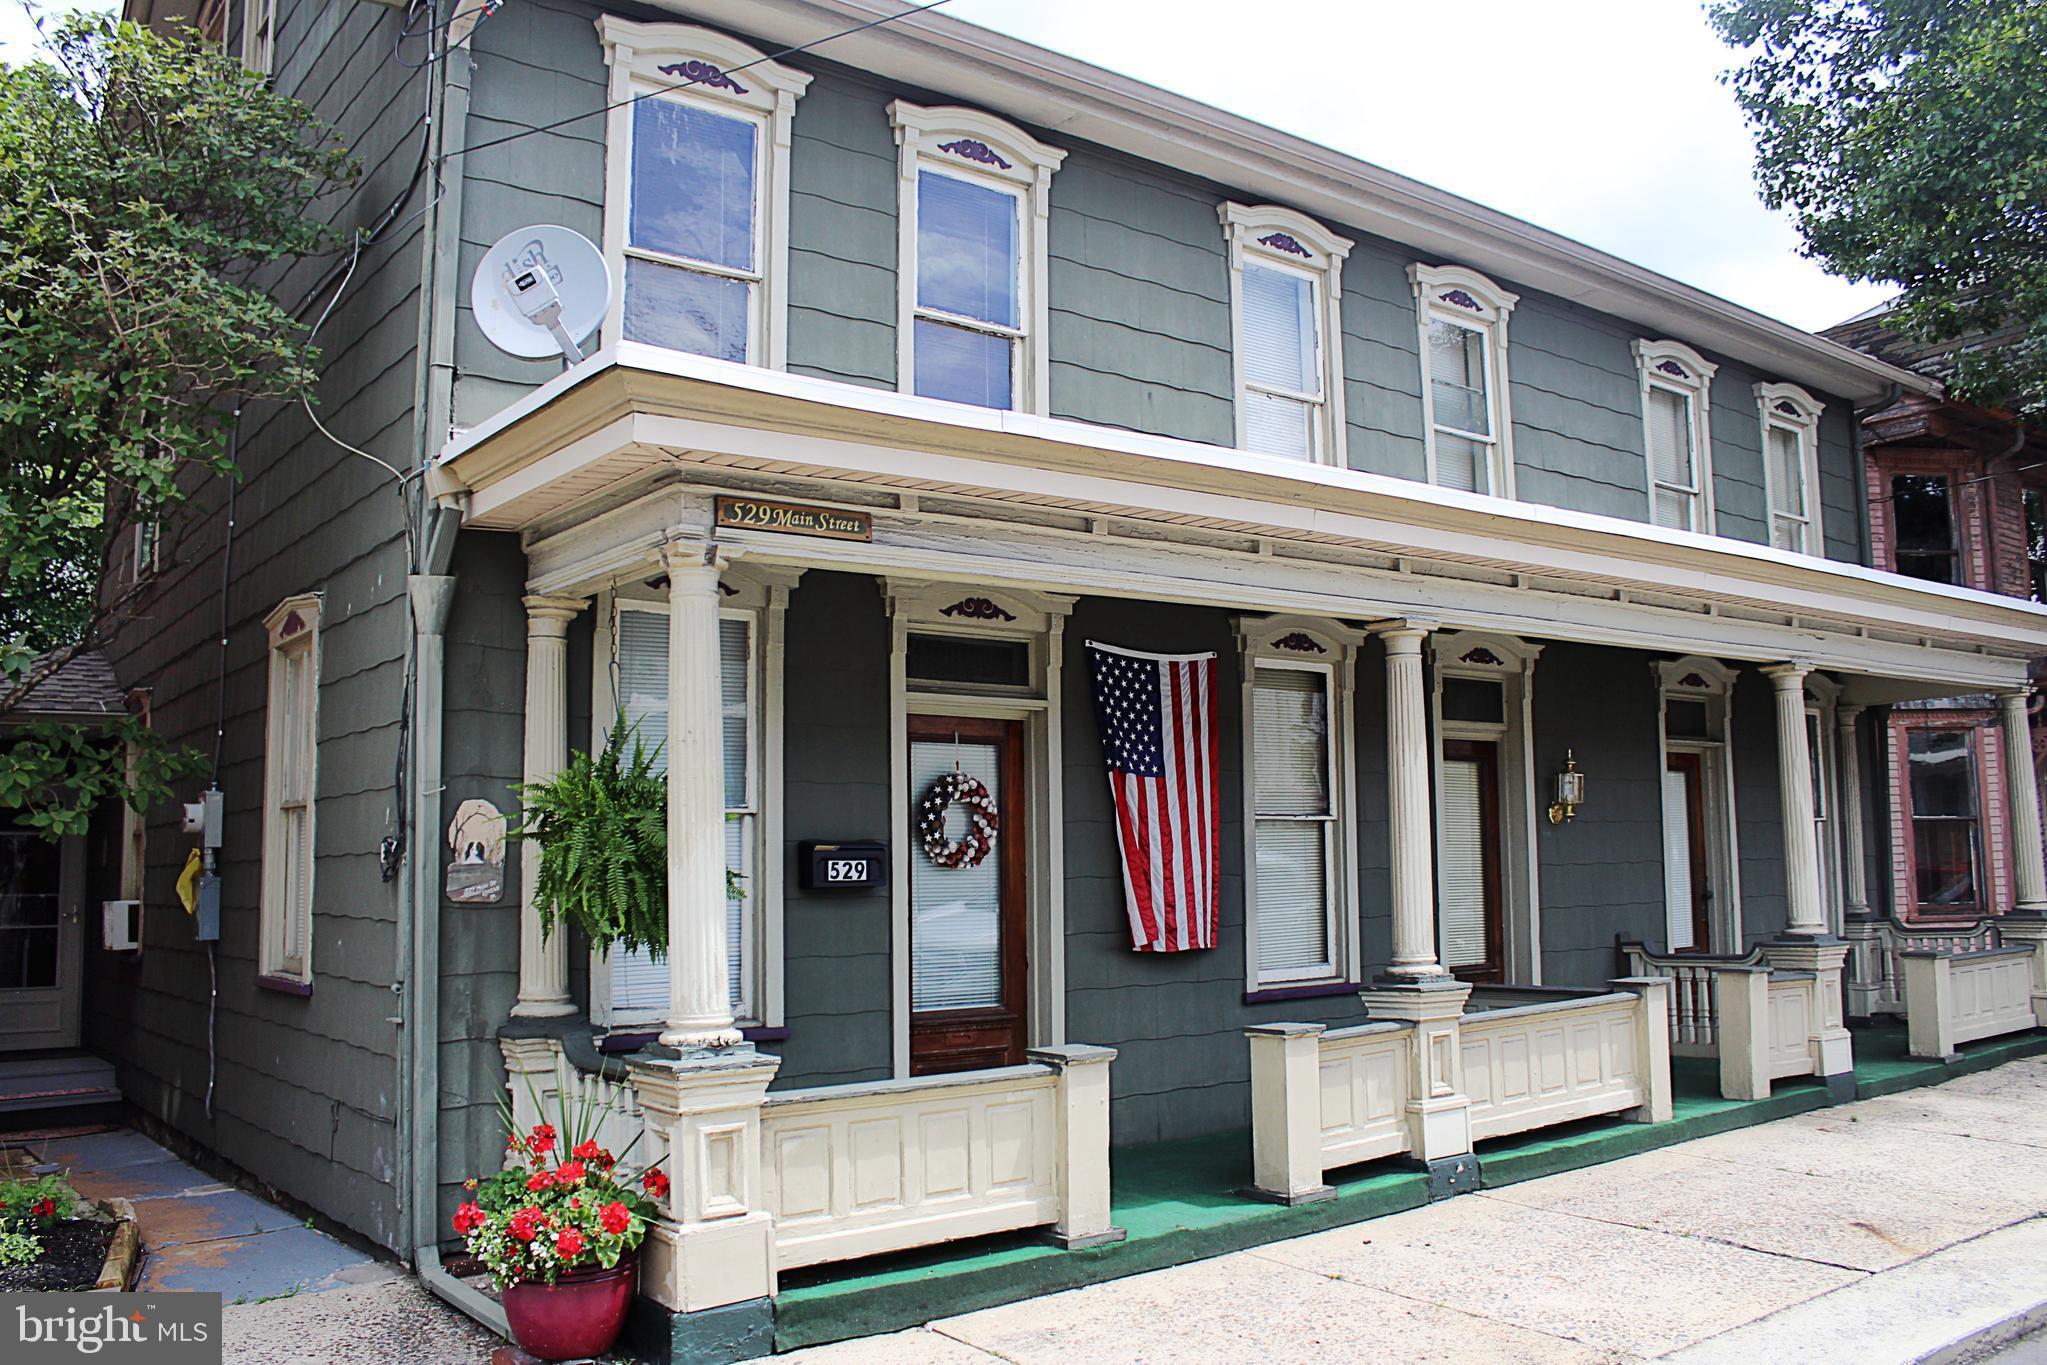 529 MAIN STREET, LYKENS, PA 17048